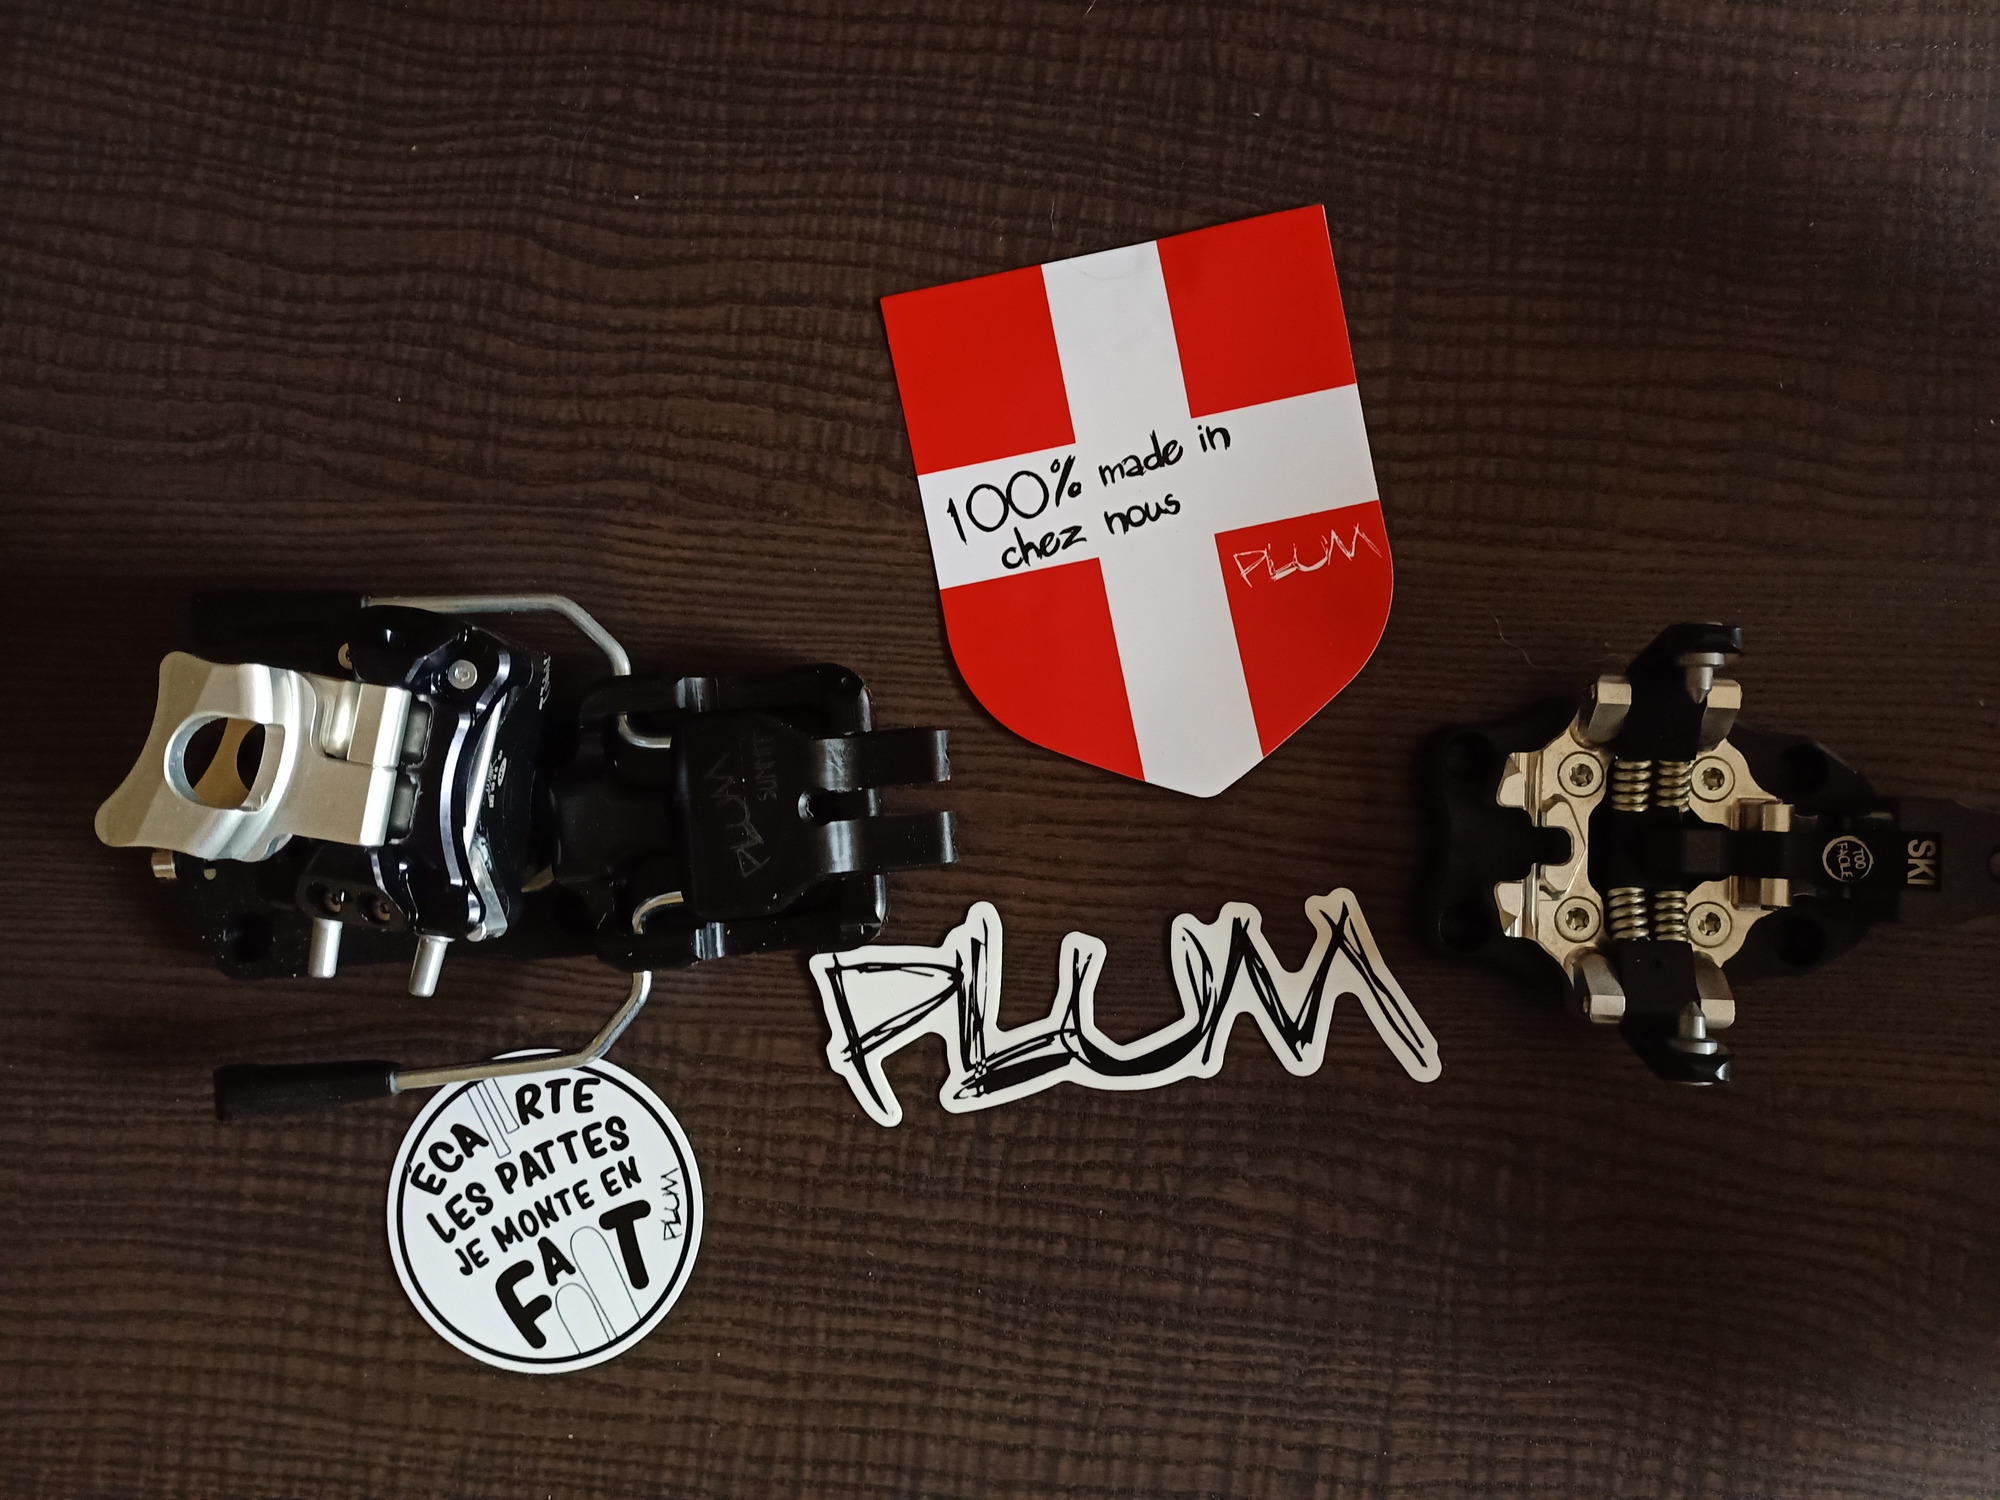 Plum Summit 12 stopper